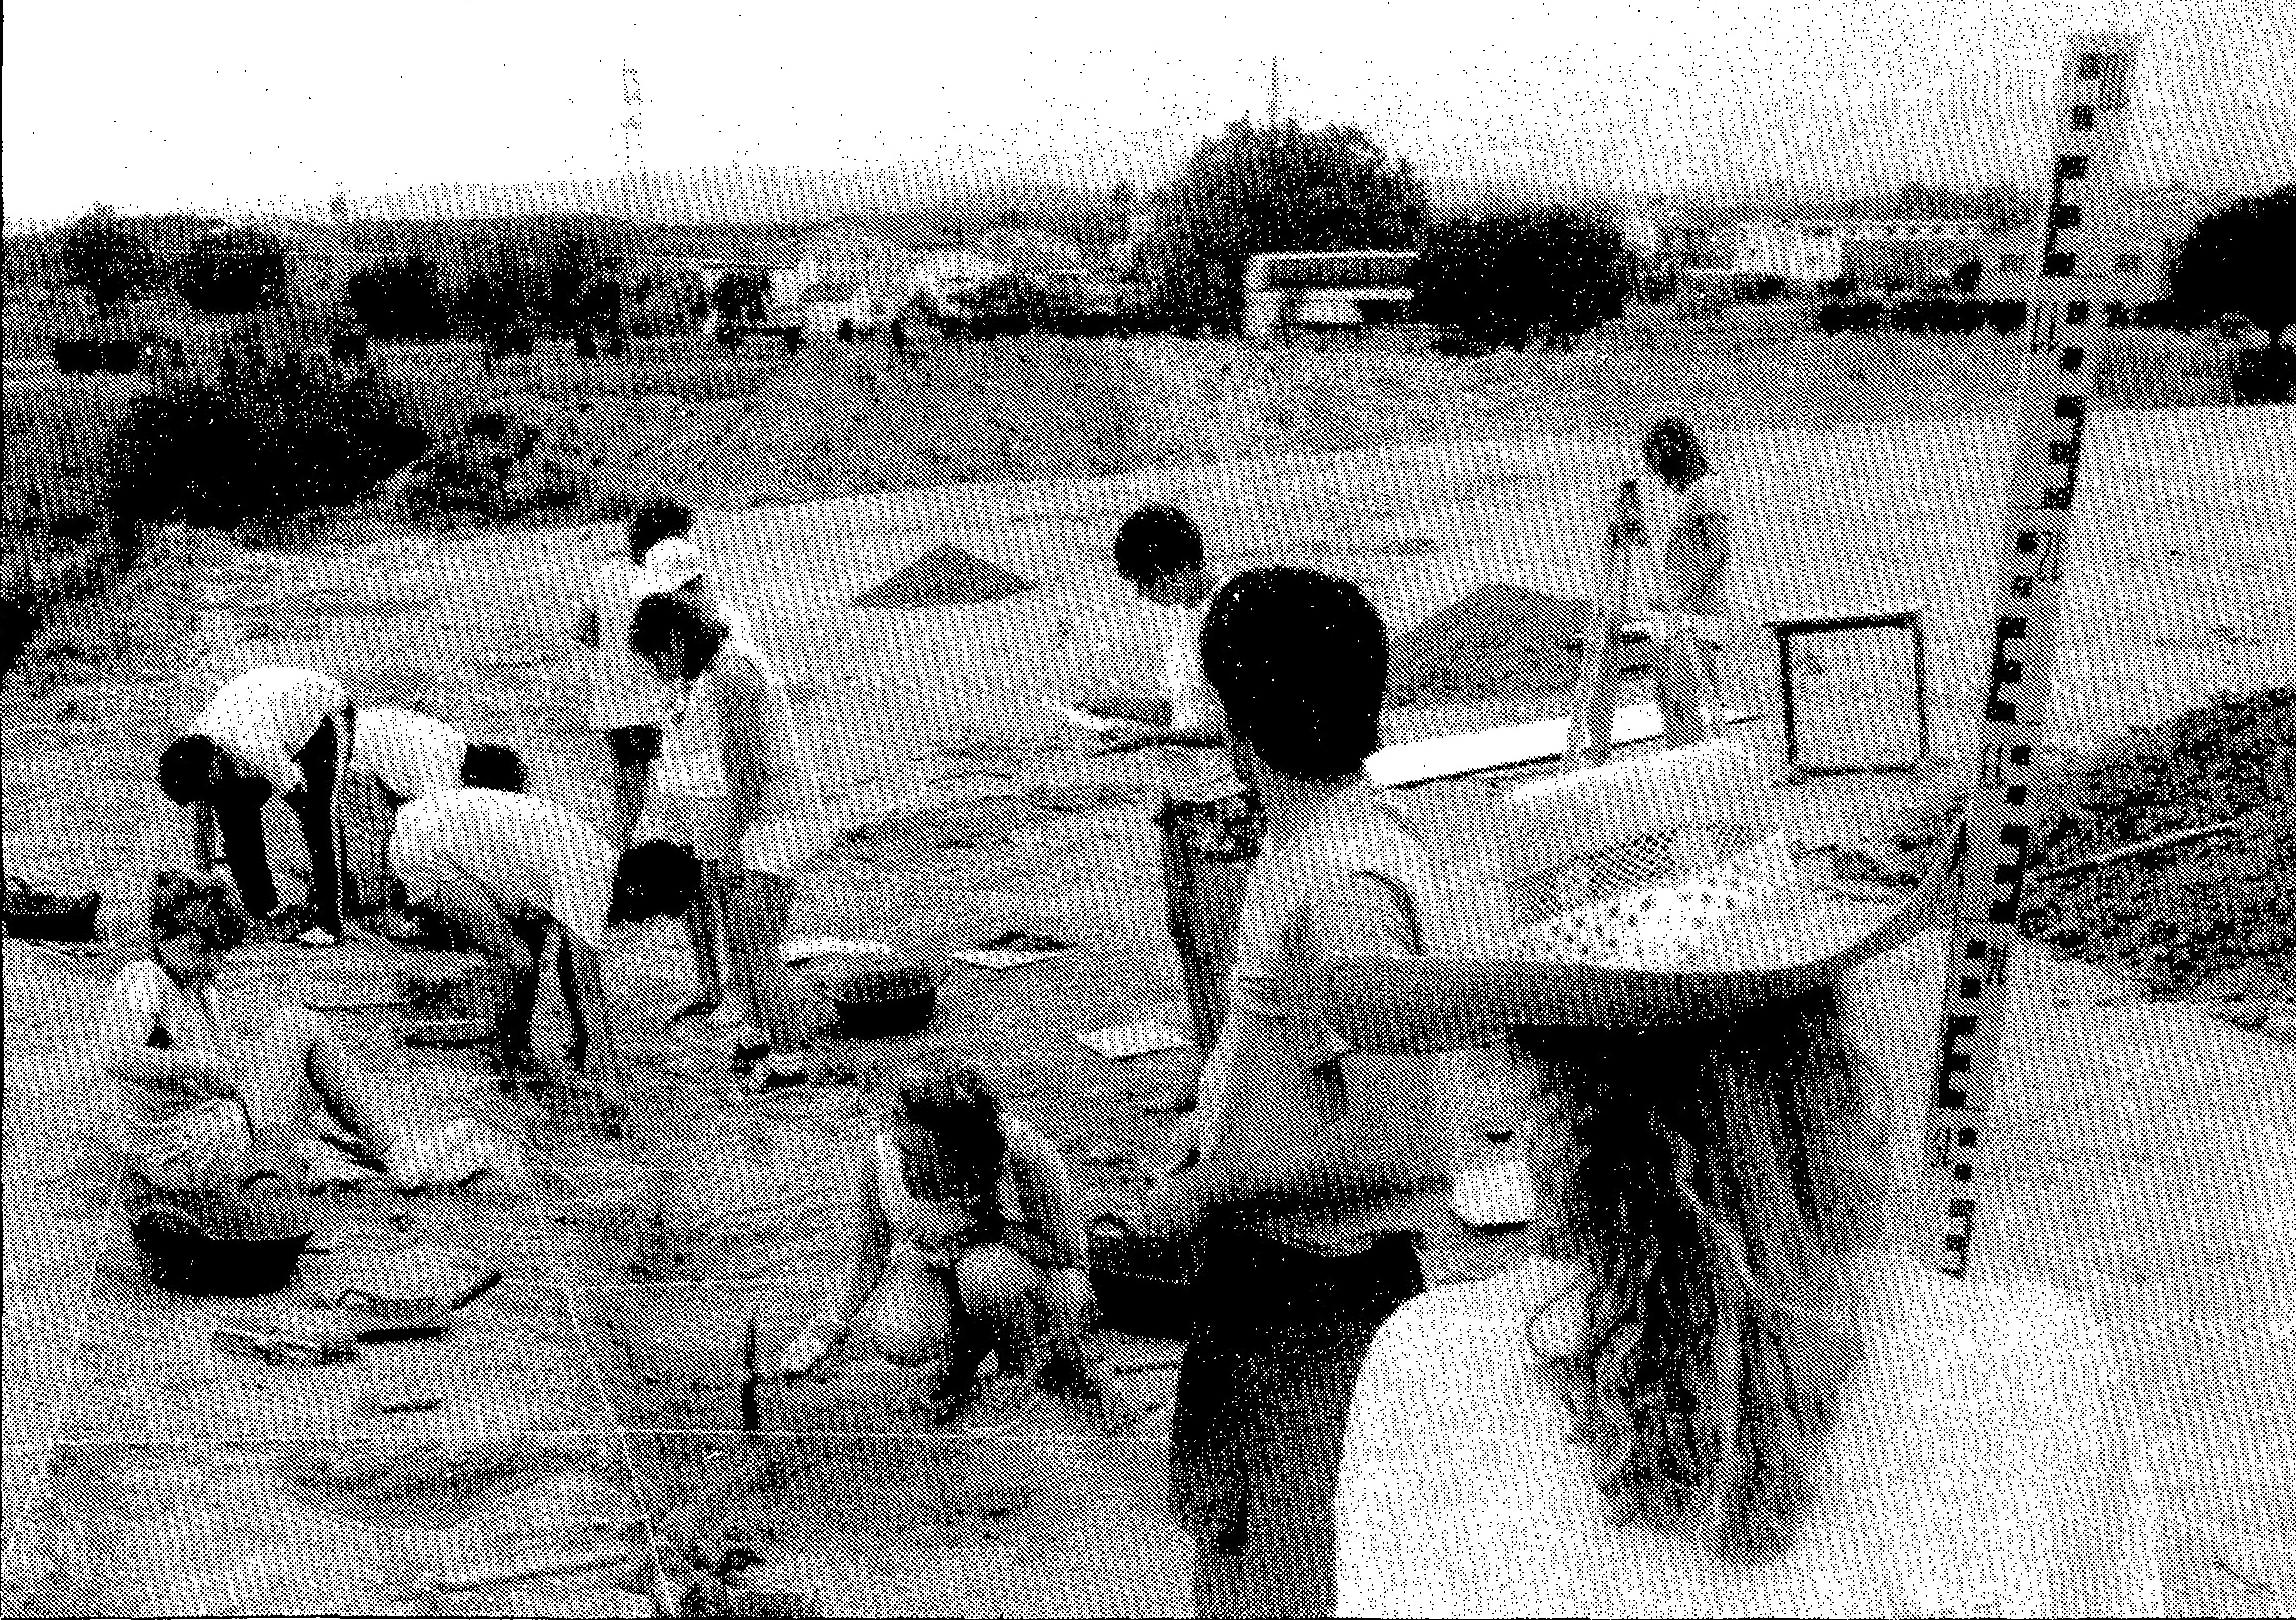 Foto: Pere Duran. Diari de Girona, 5 juliol 1989